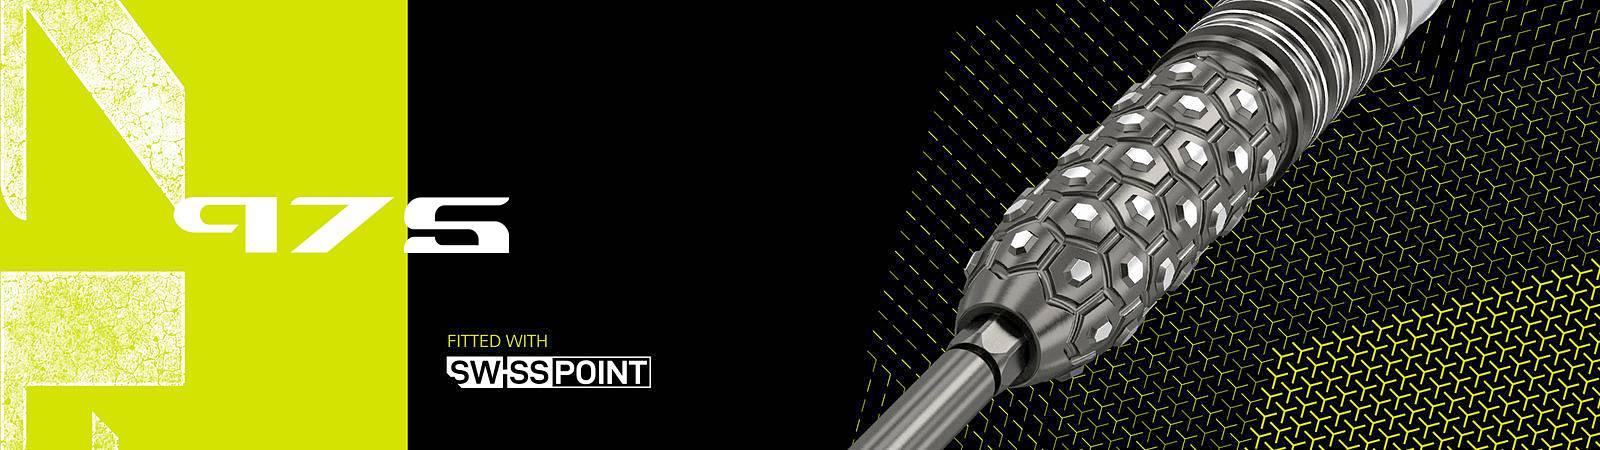 Target-Swiss-Point-975-Steeldarts